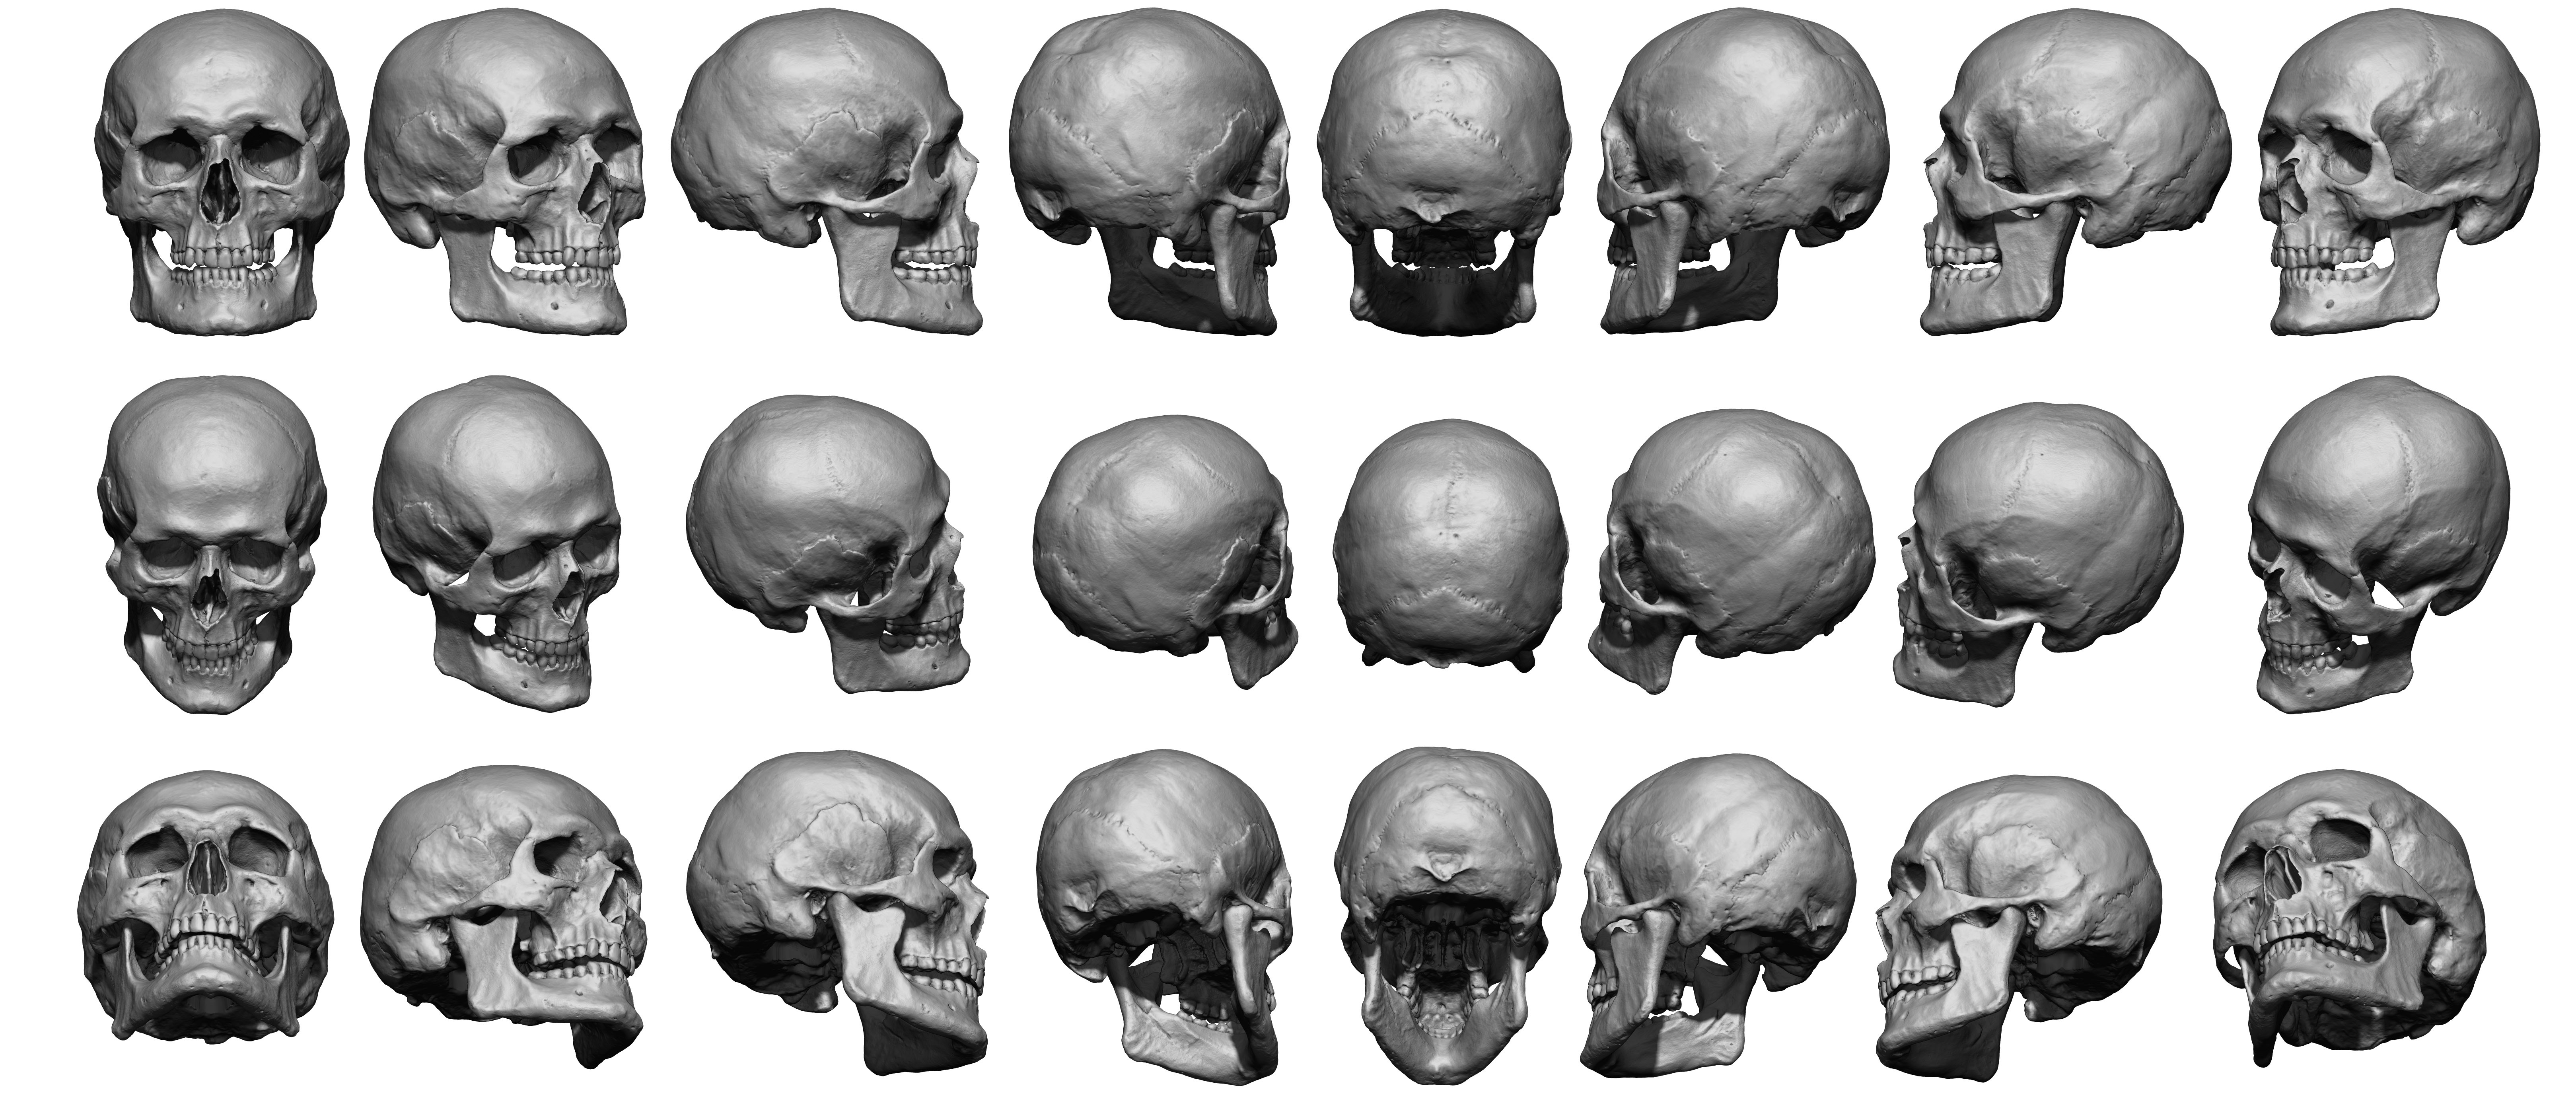 Super High Res Skull Sheet - Anatomy 360